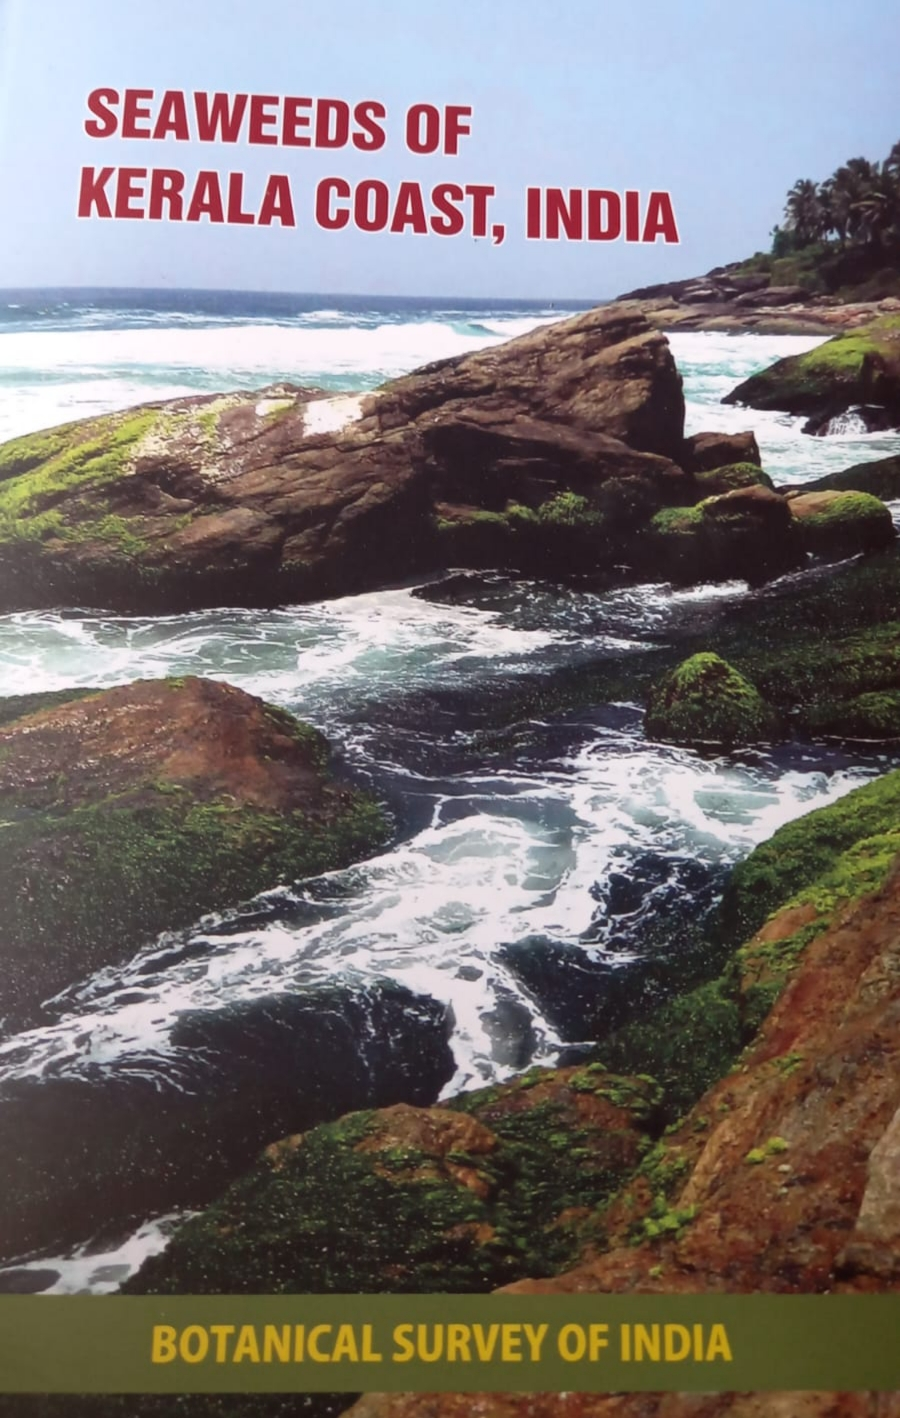 Seaweeds of Kerala Coast, India